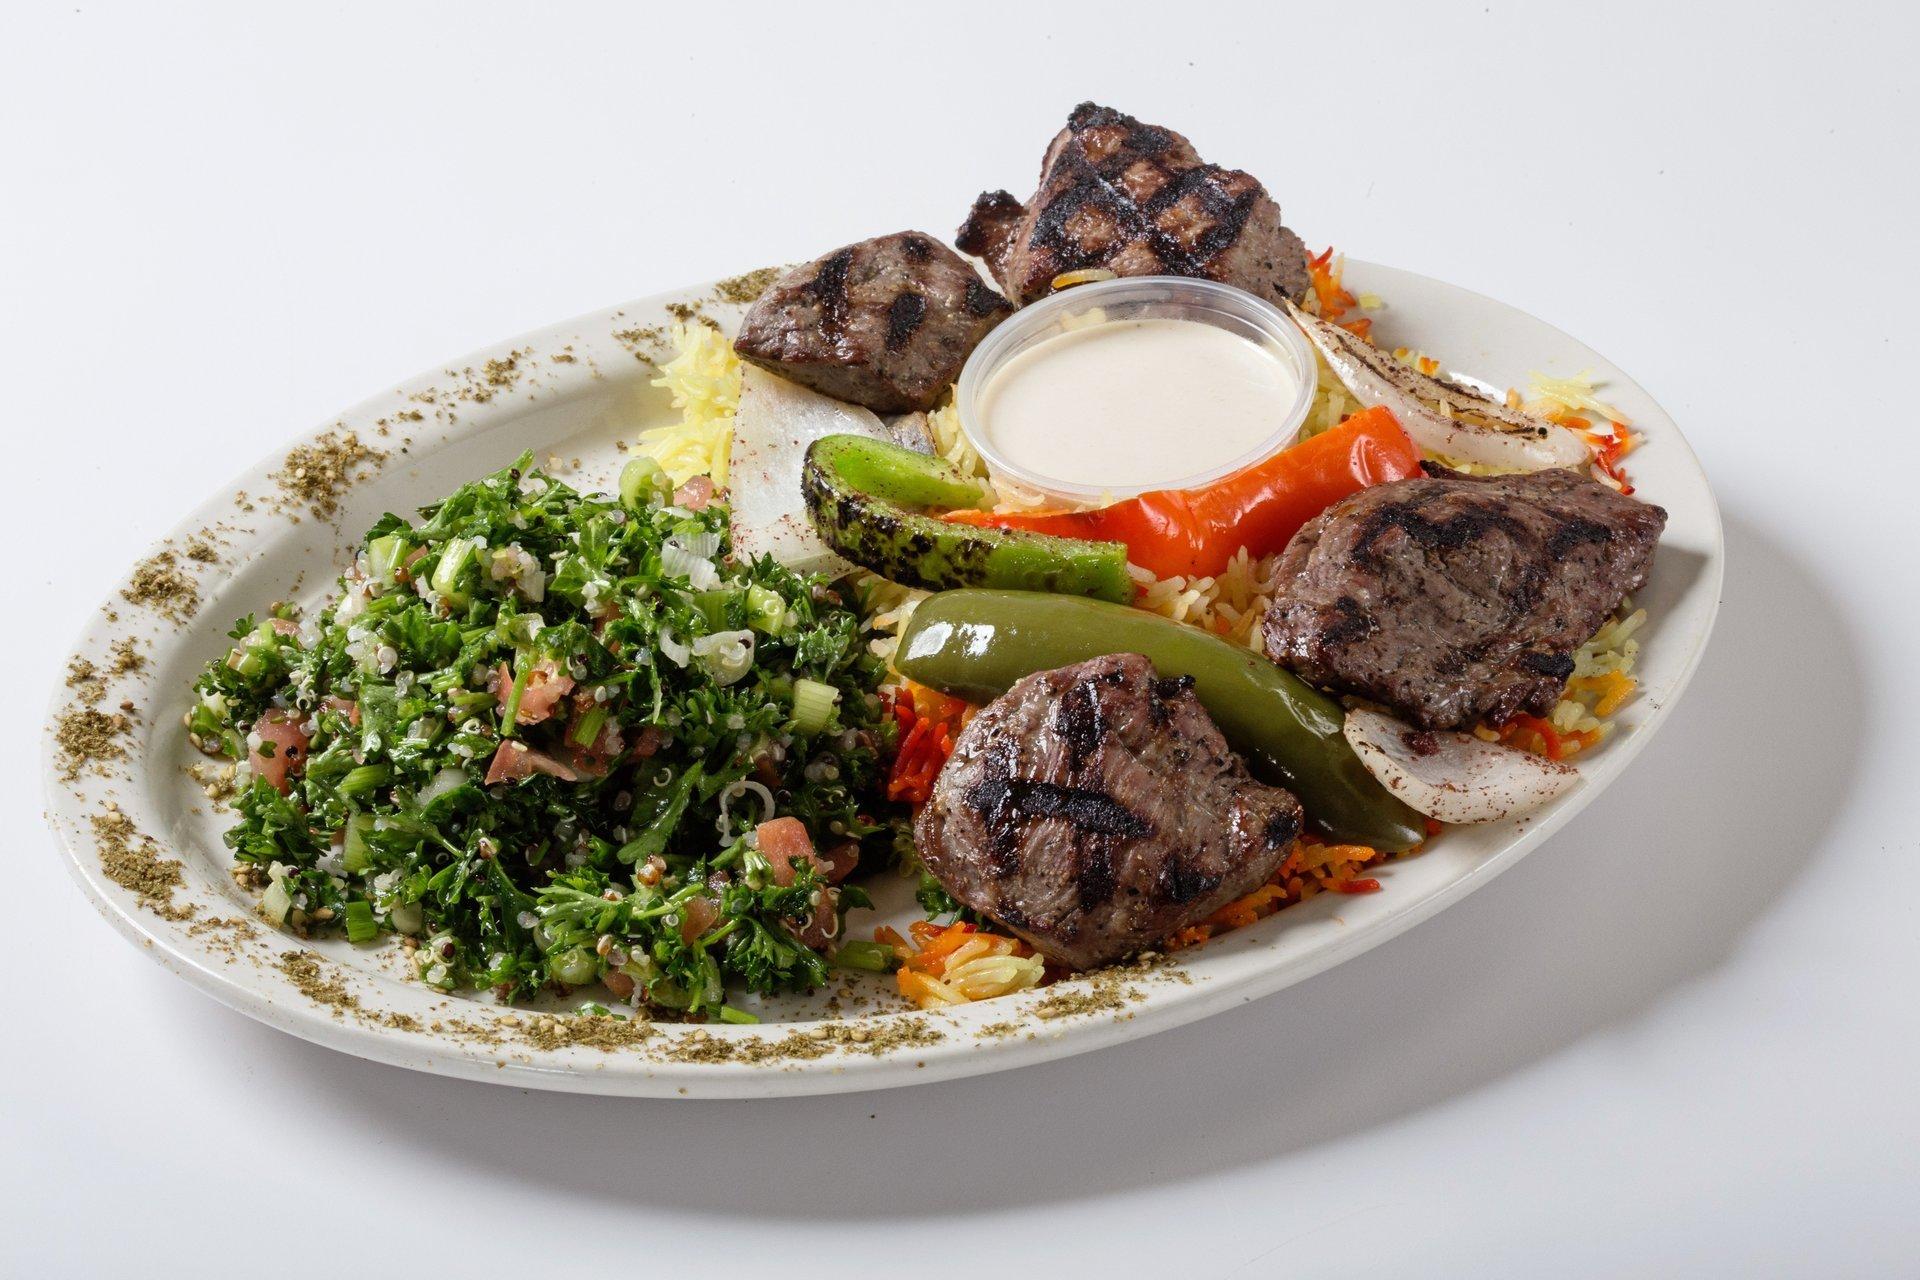 El basha mediterranean eatery mediterranean food victor for Athena mediterranean cuisine ny